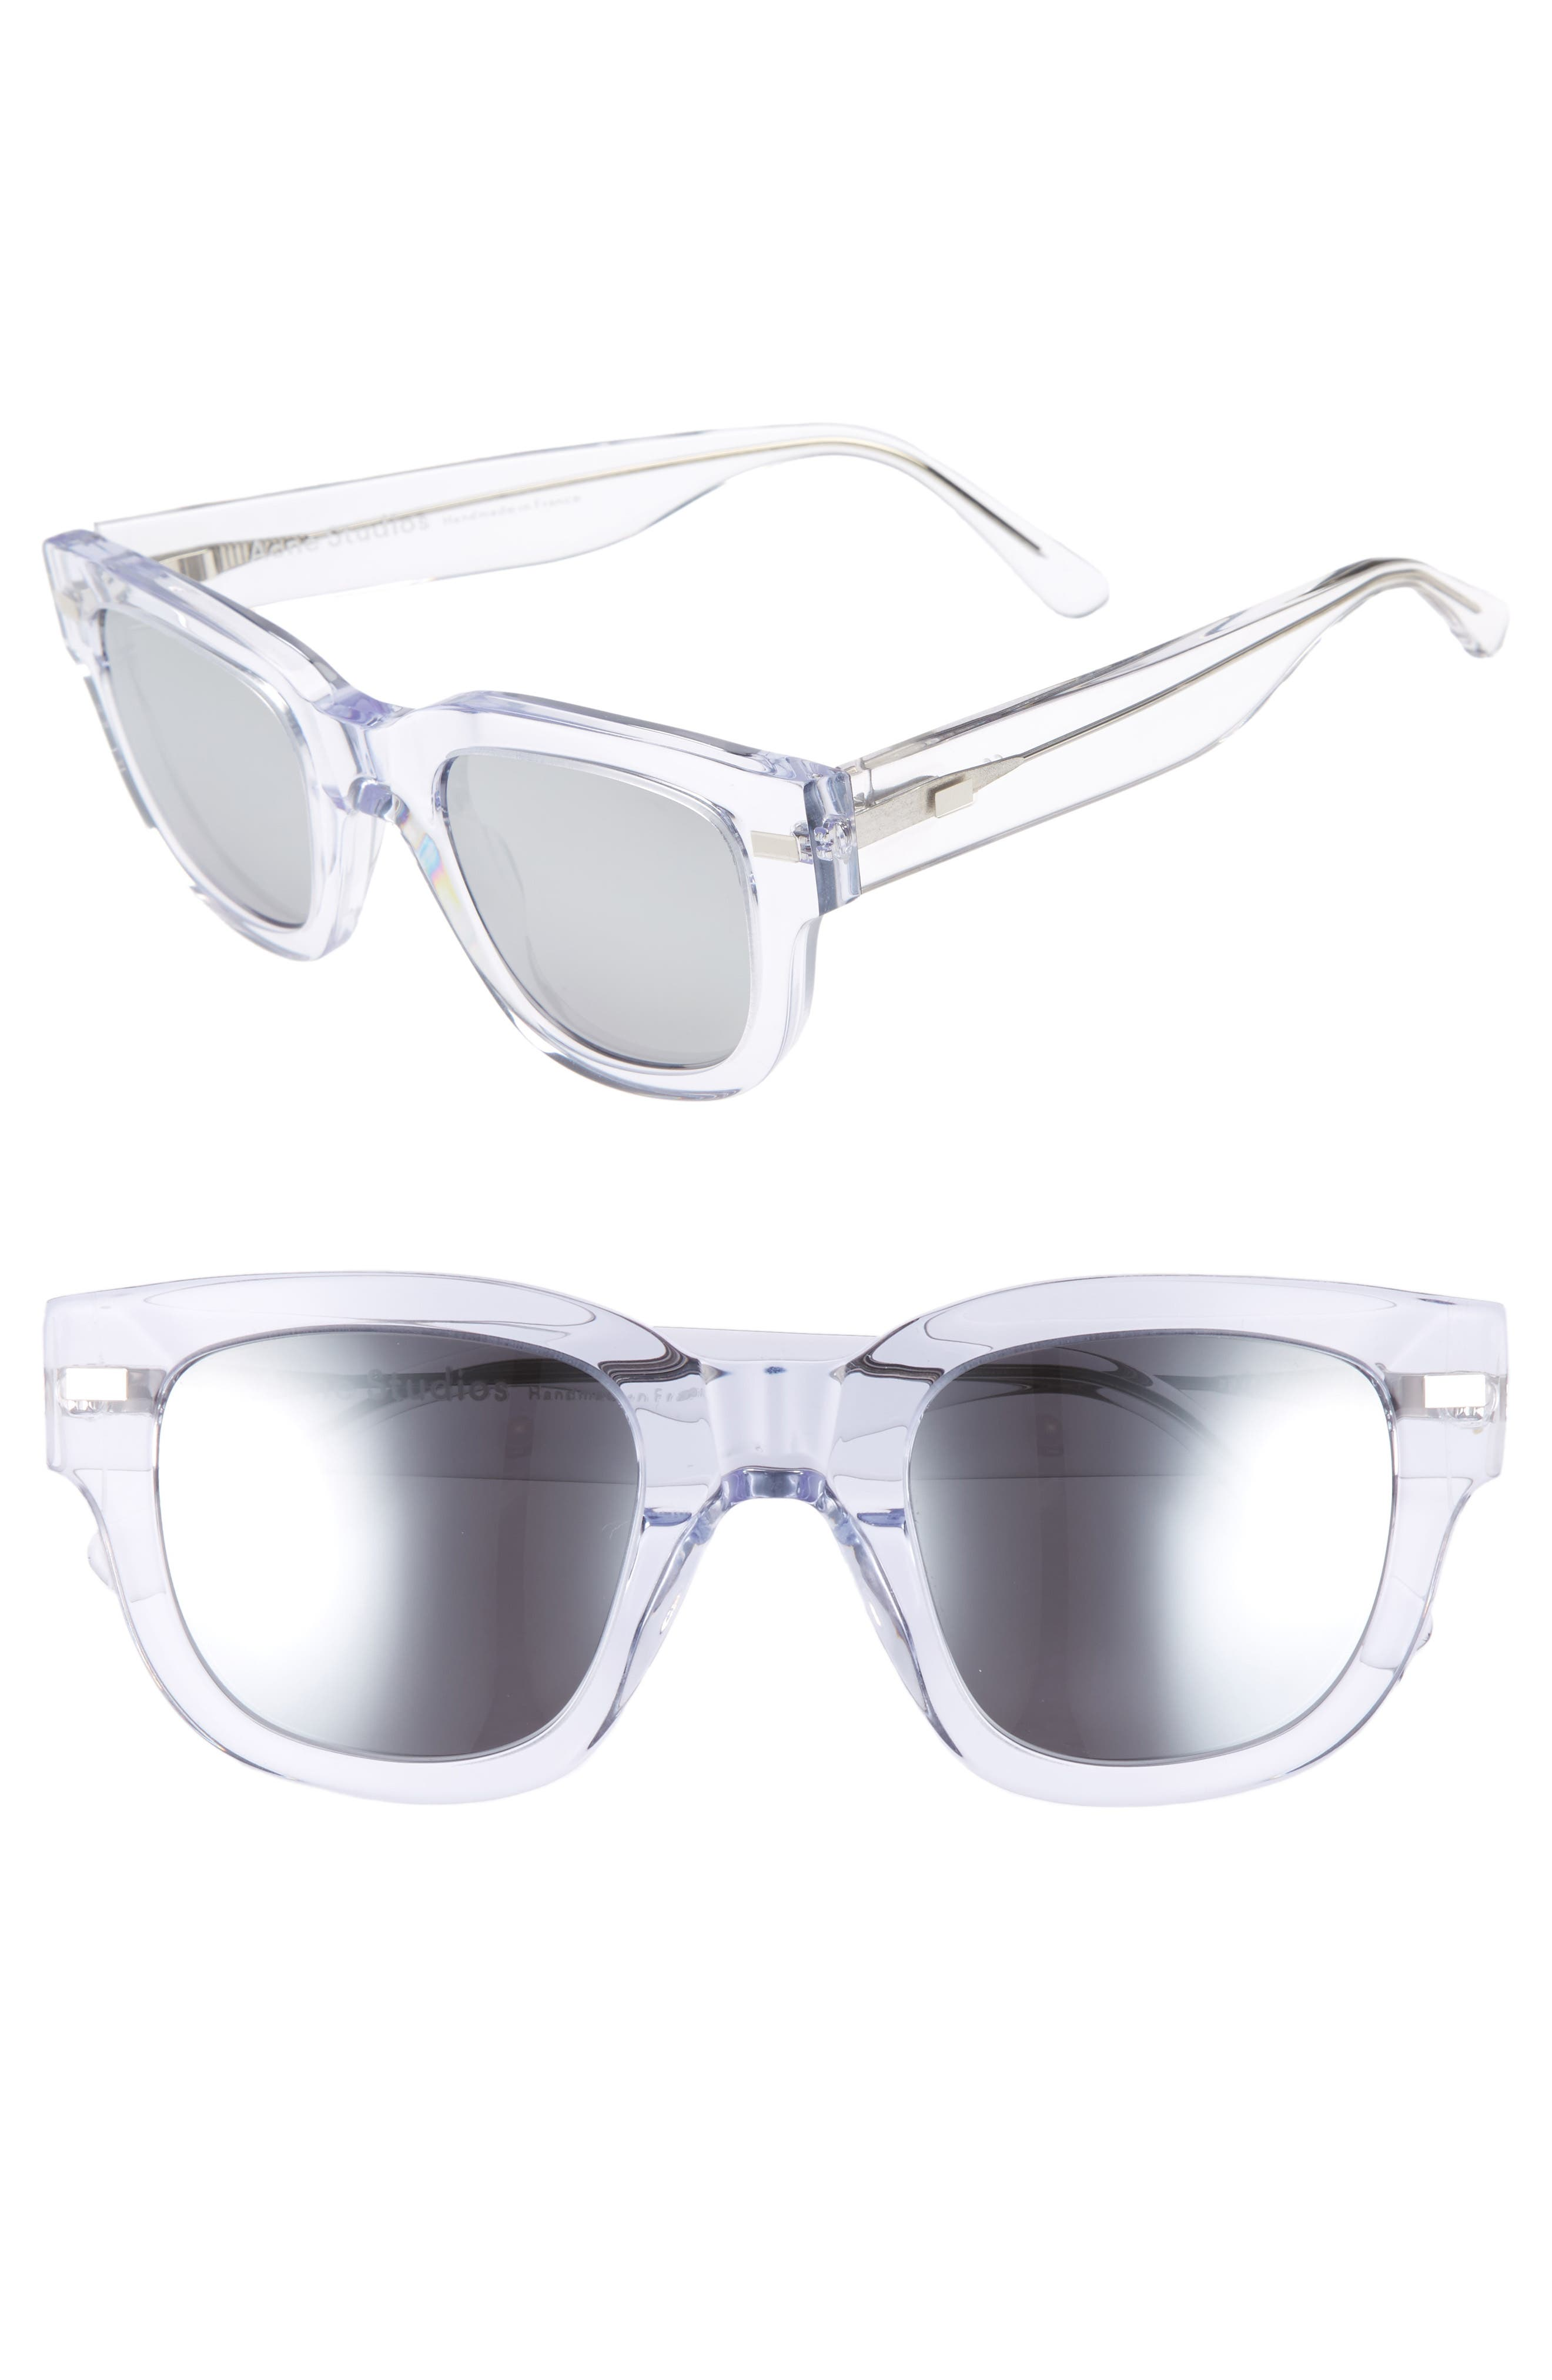 47mm Sunglasses,                         Main,                         color,